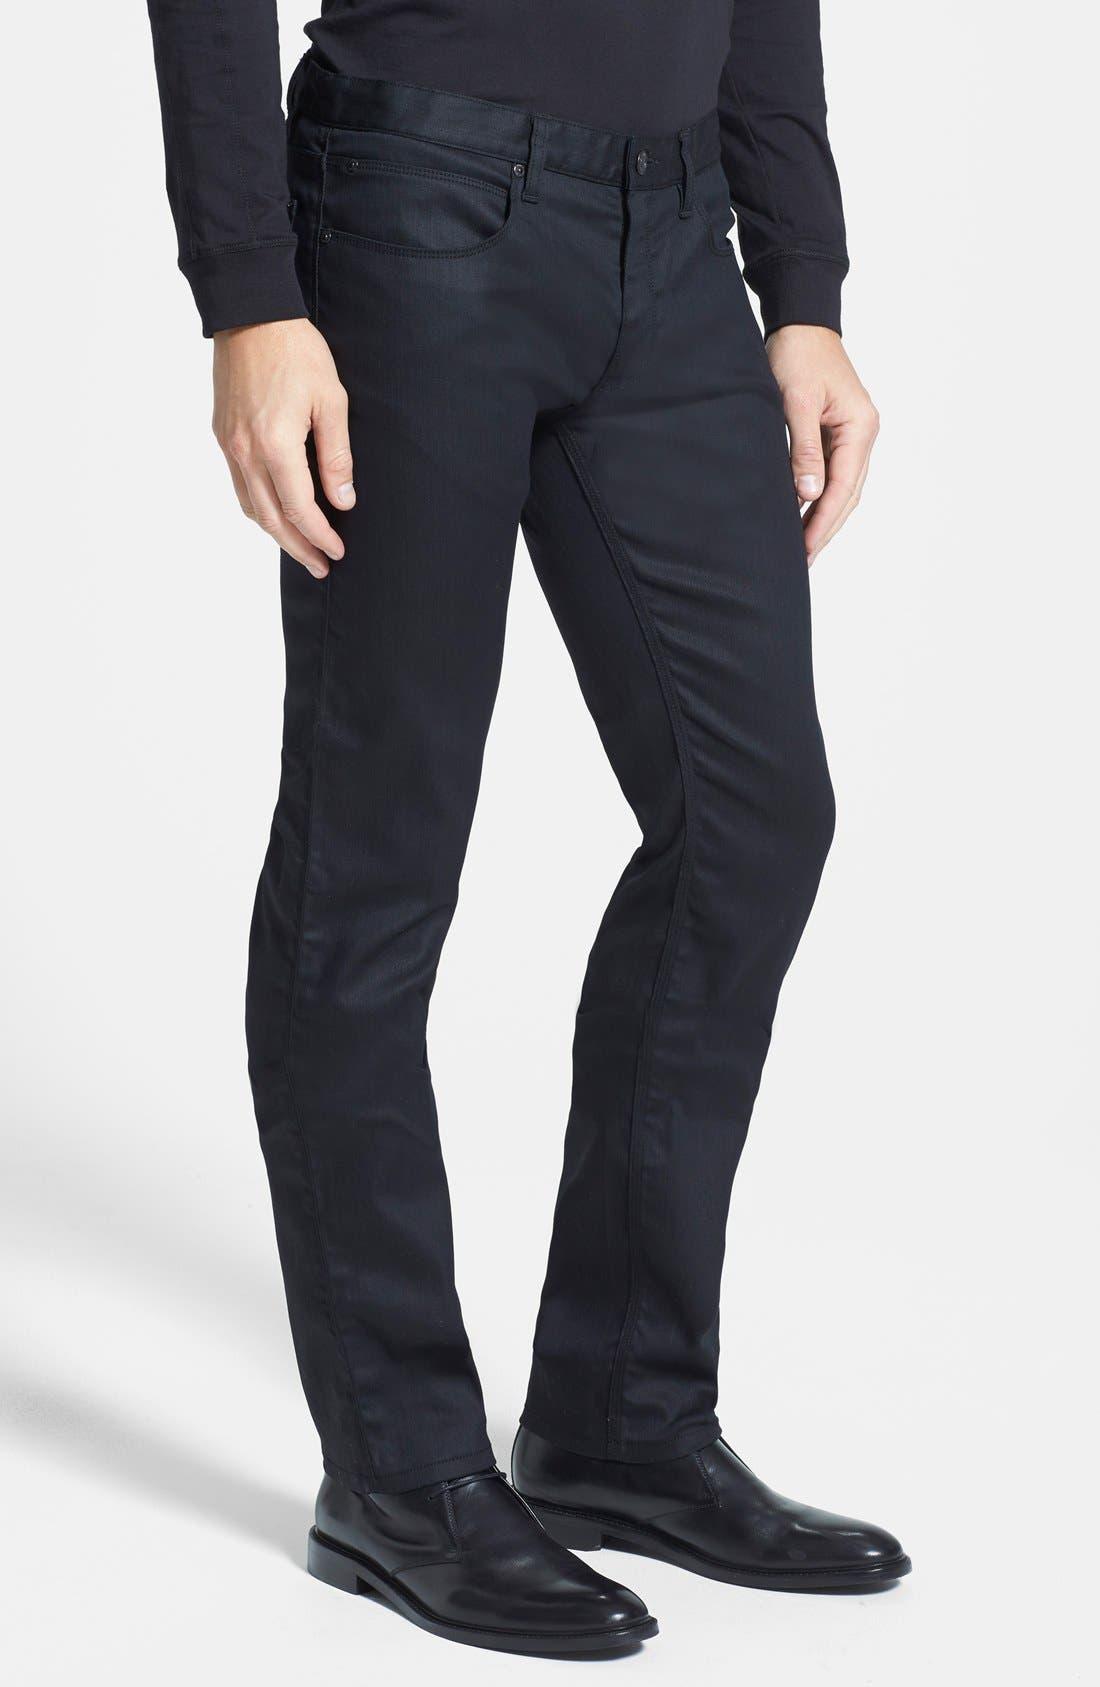 HUGO '708' Slim Fit Jeans,                             Alternate thumbnail 5, color,                             001